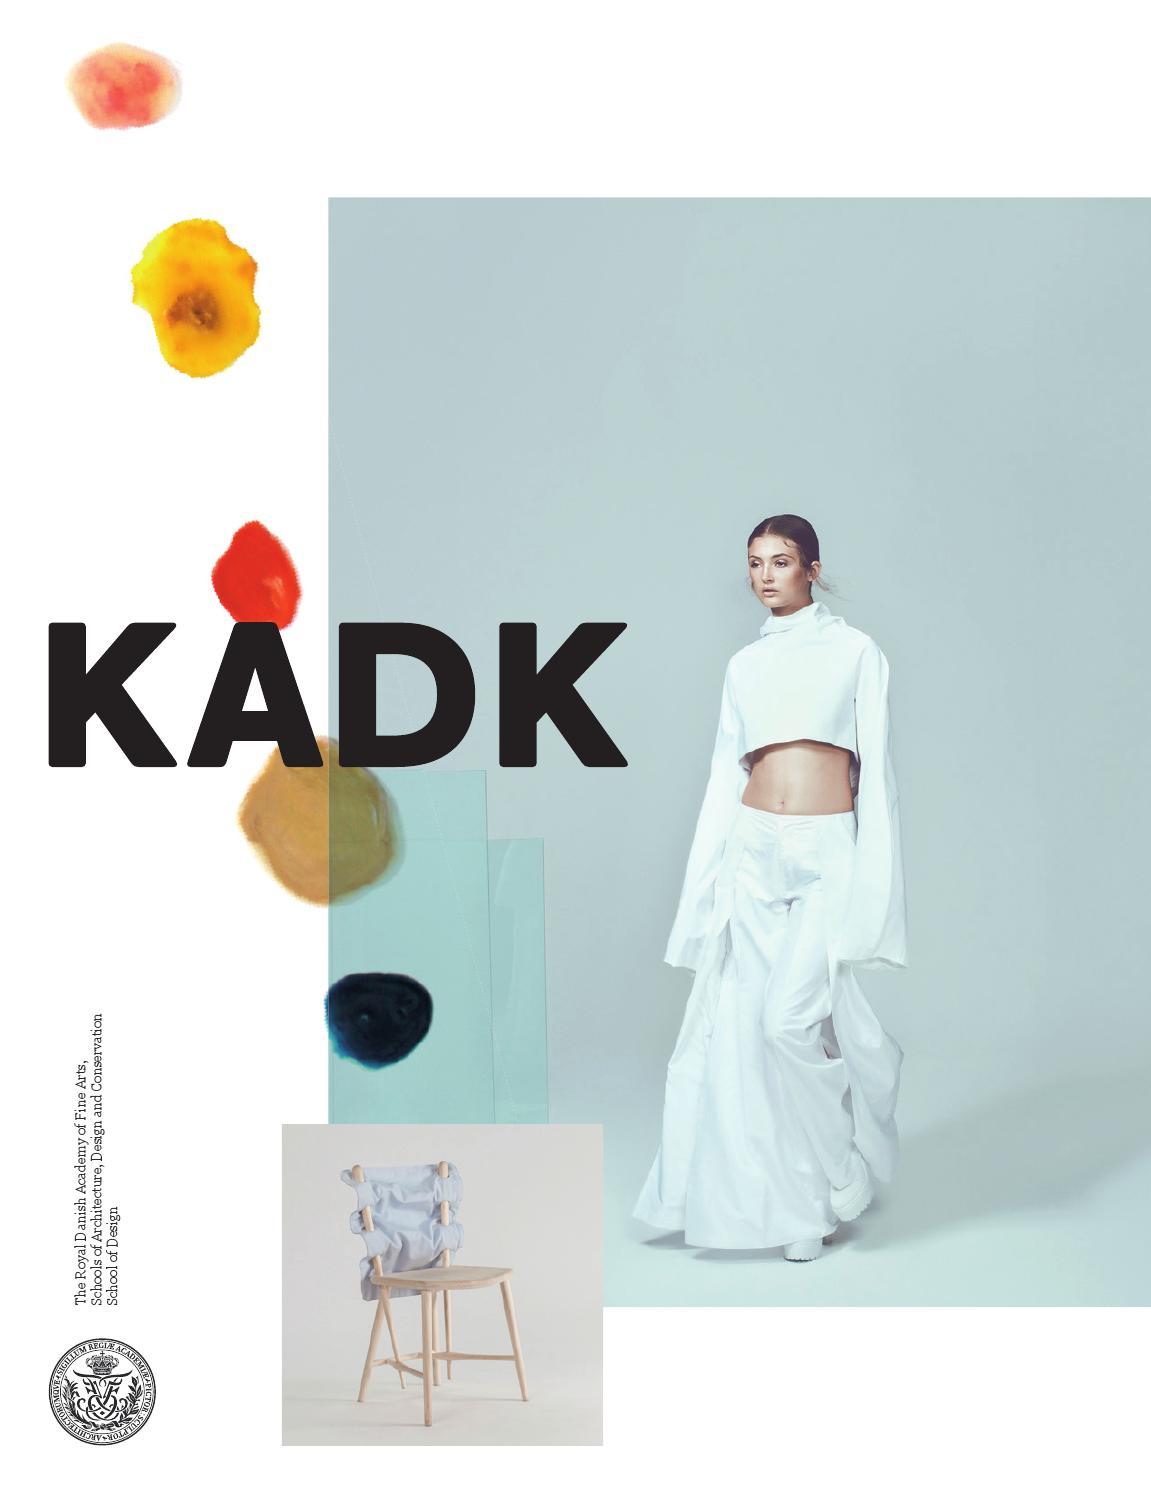 Kadk School Of Design By Kunstakademiets Skoler For Arkitektur Design Og Konservering Issuu